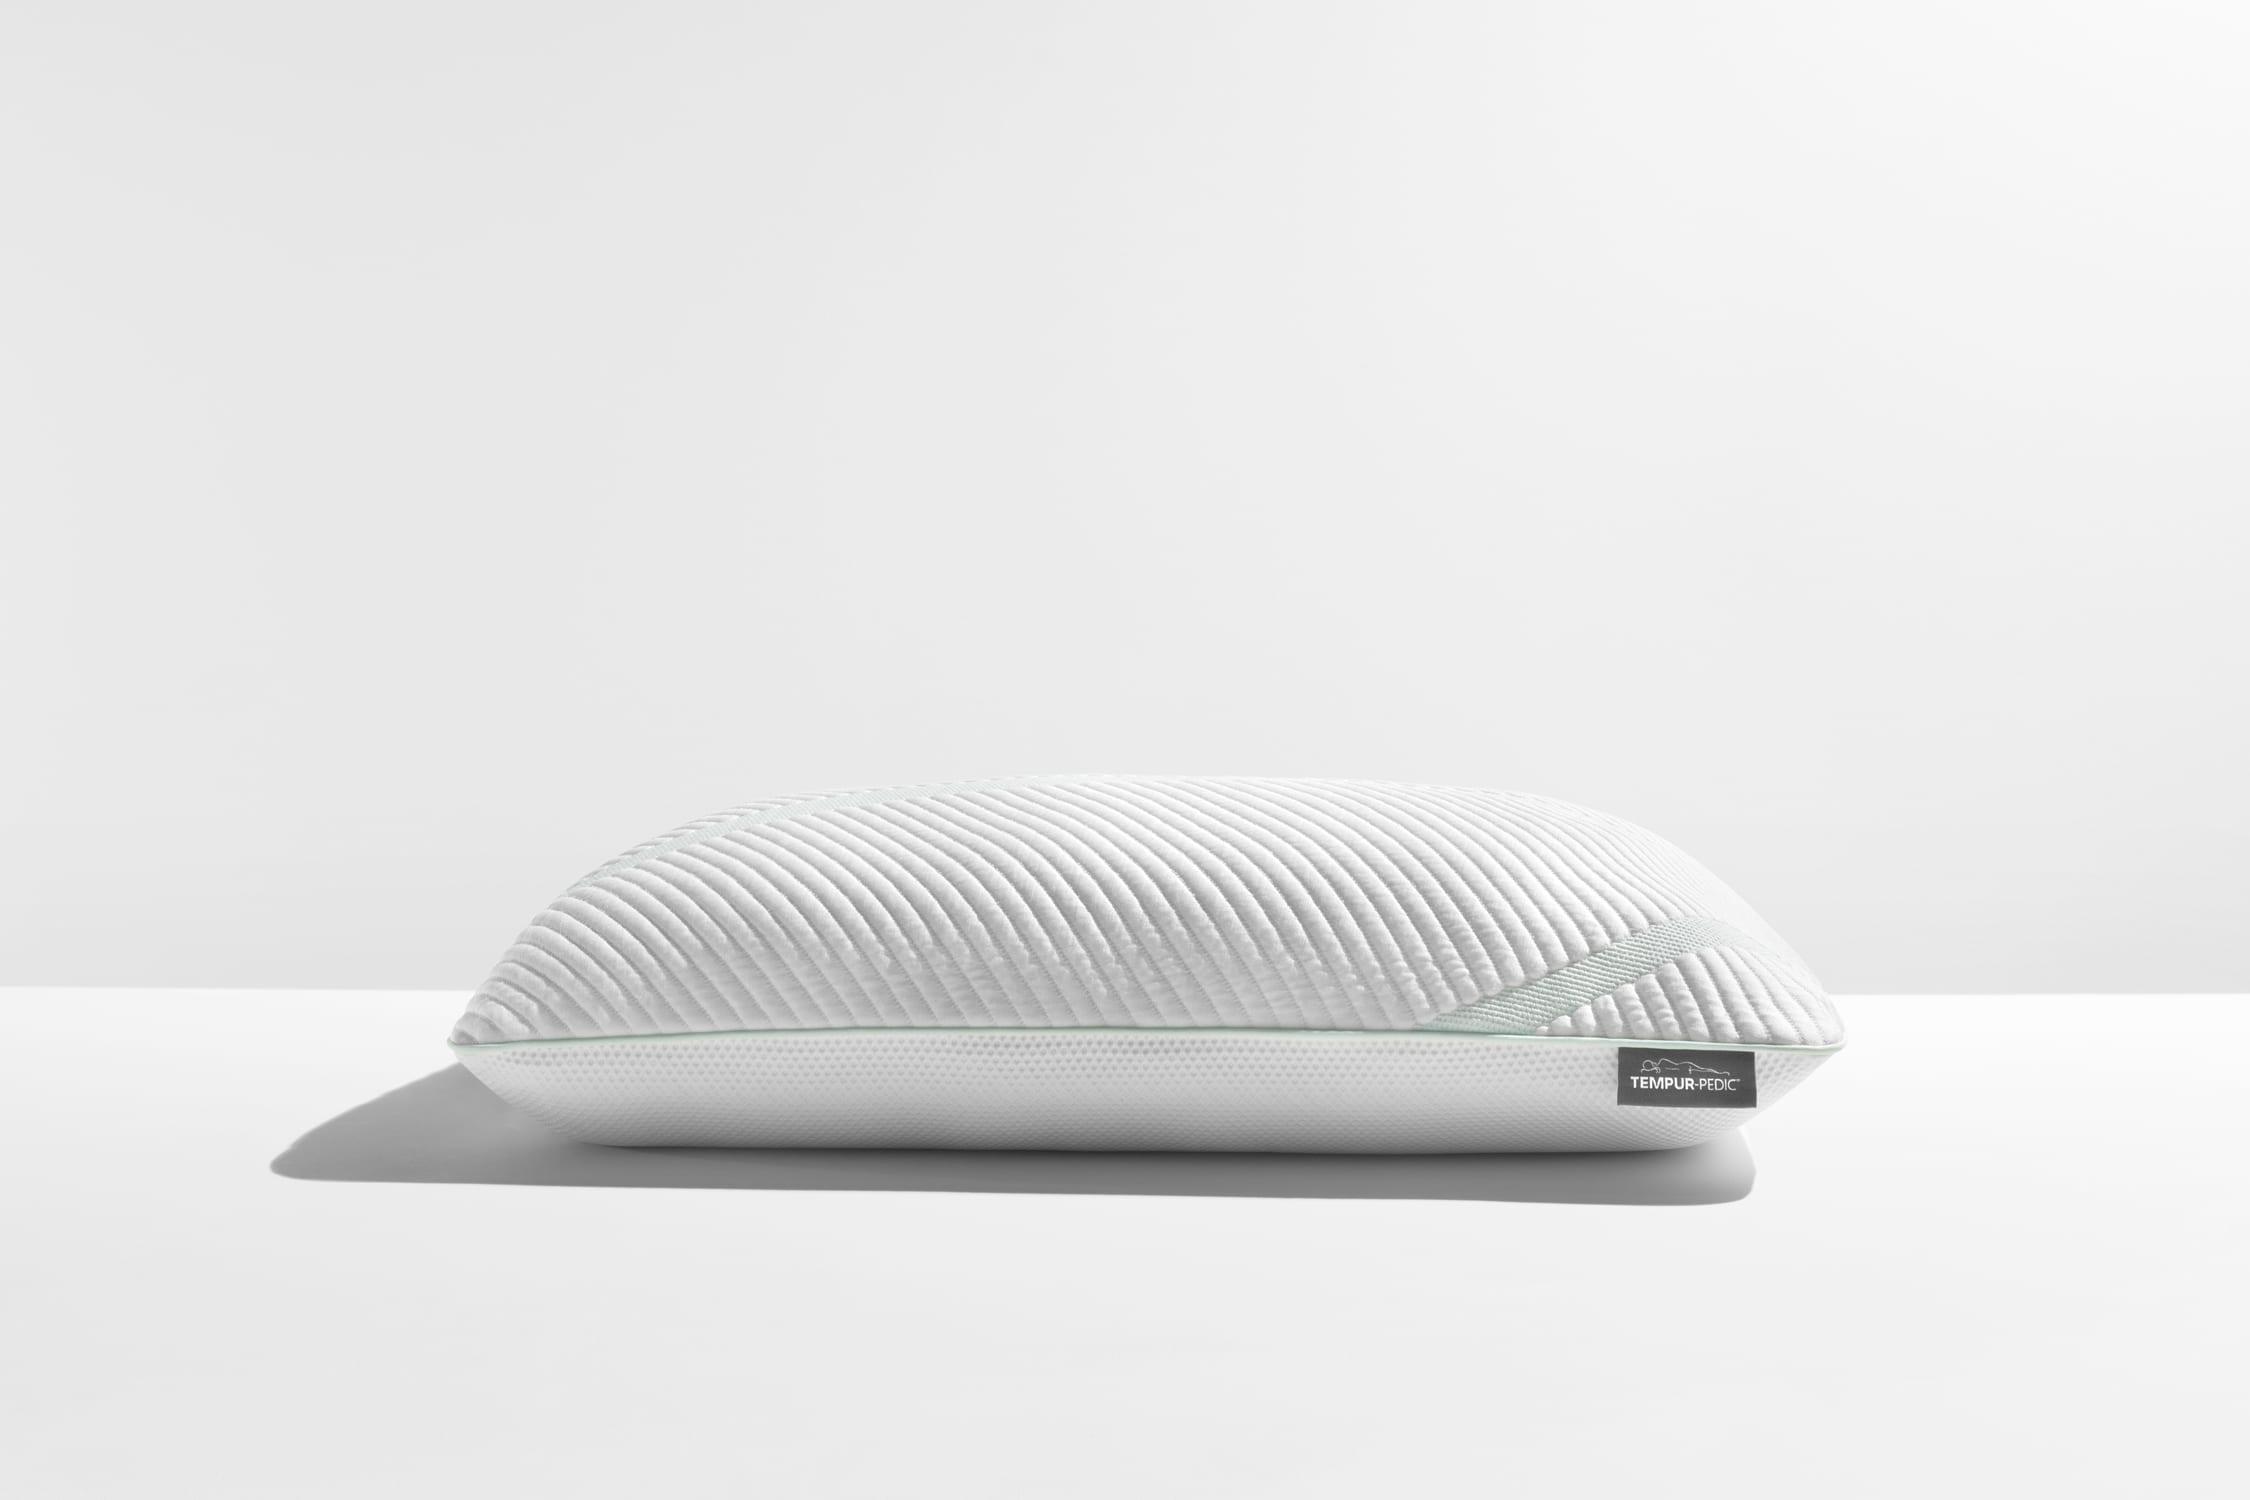 Tempur Pedic Pro Lo Pillow Best Mattress